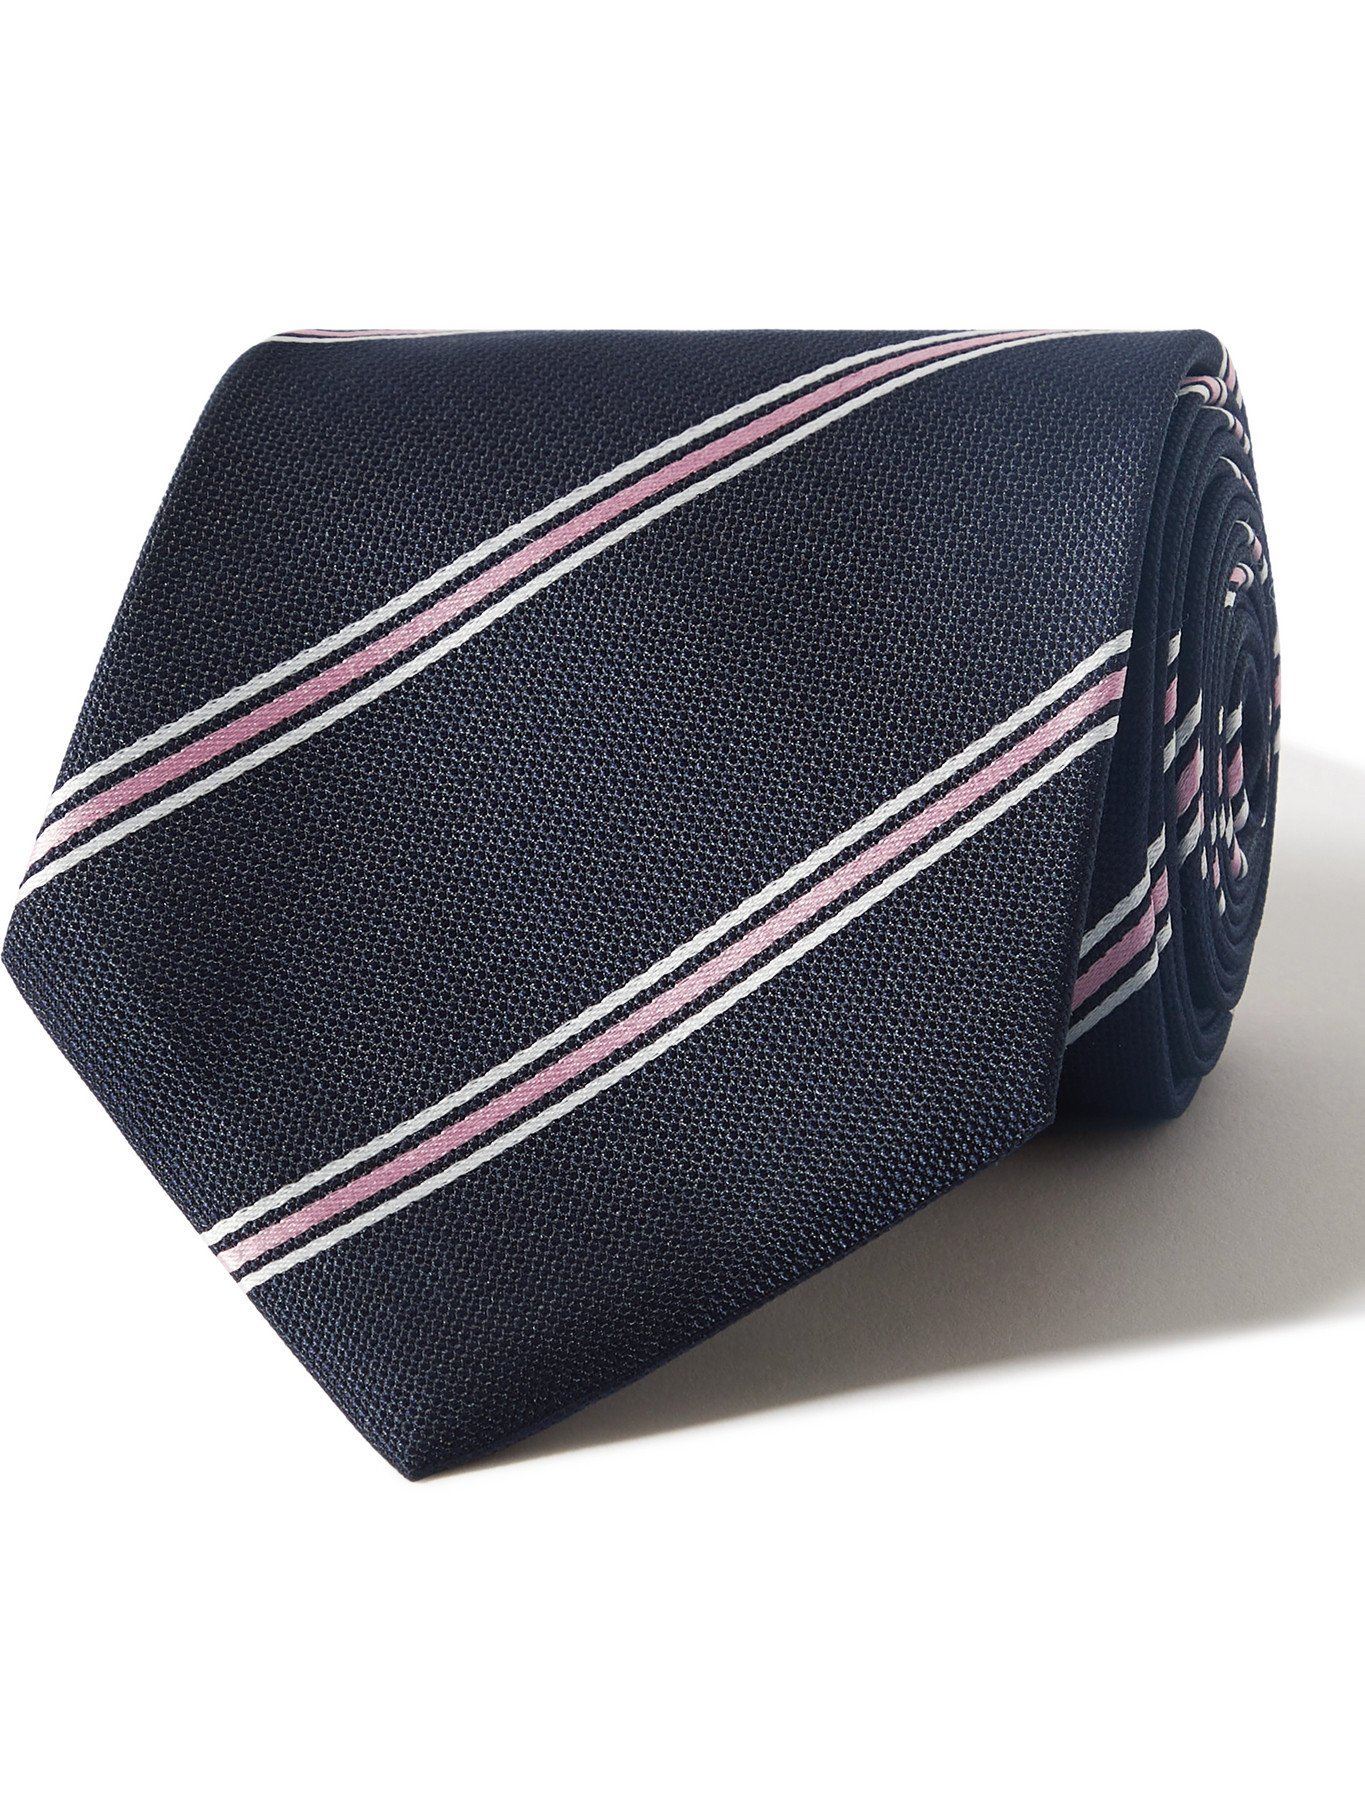 HUGO BOSS - 8cm Striped Silk-Jacquard Tie - Blue